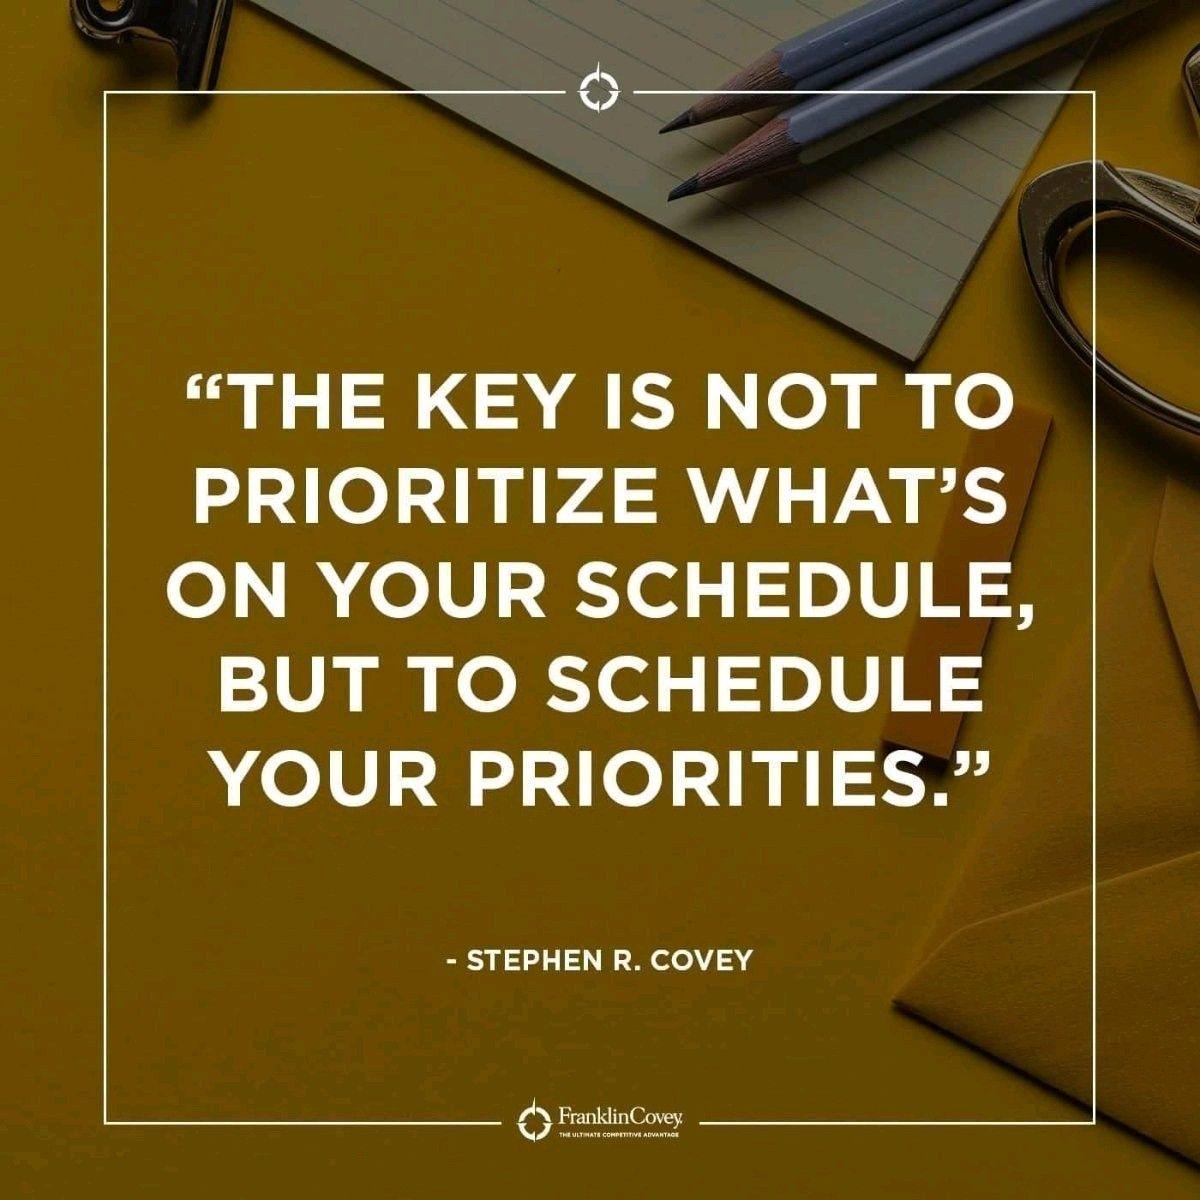 Schedule Priorities Prioritize Inspirational Quotes